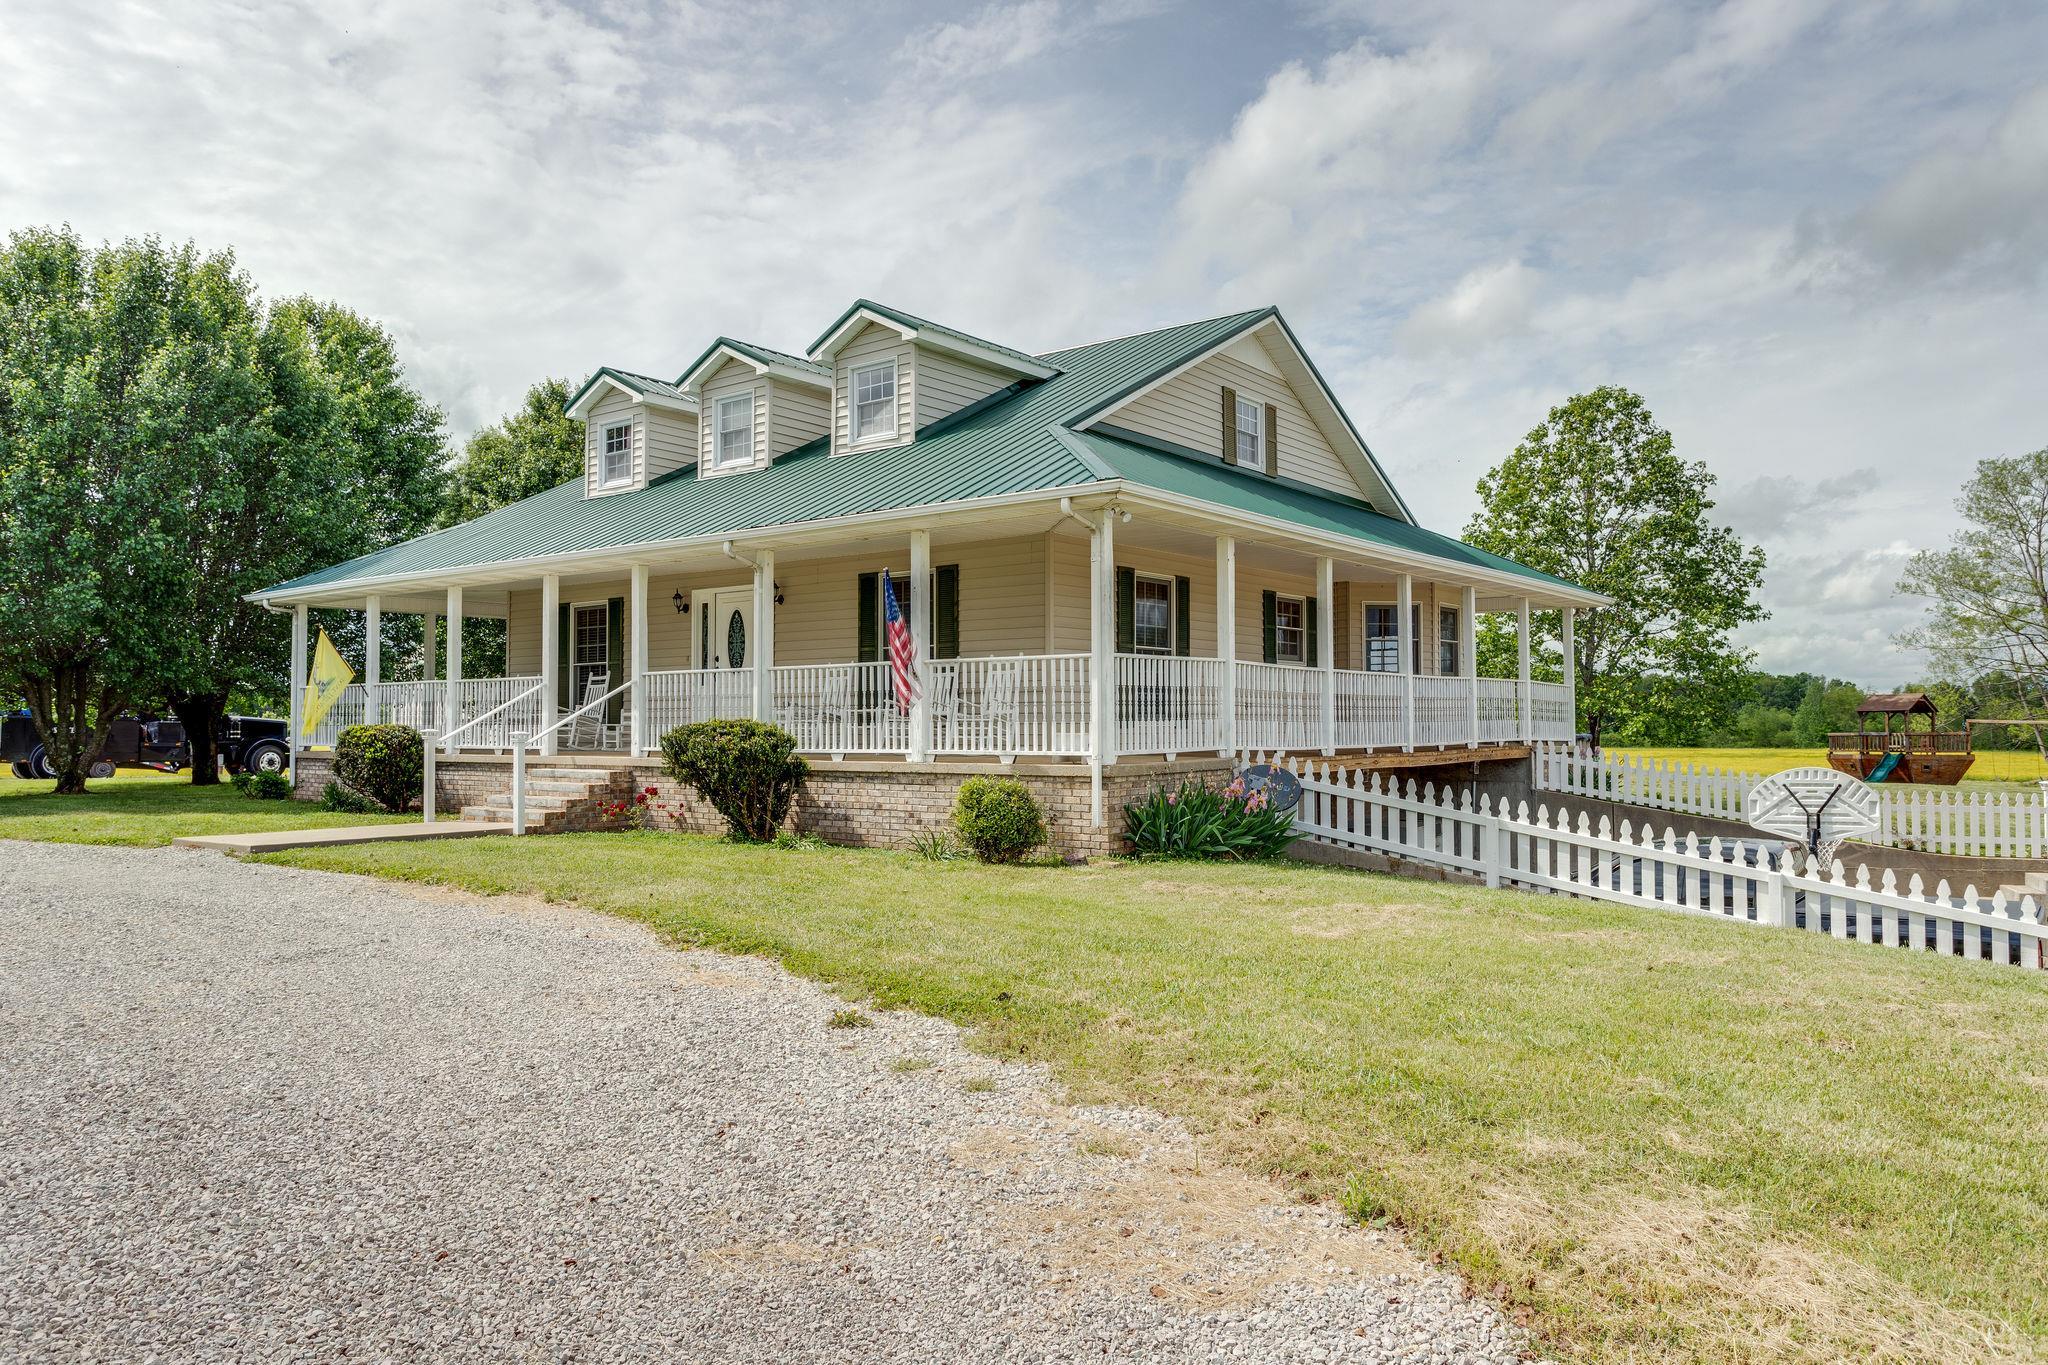 441 Colonial Rd, Hohenwald, TN 38462 - Hohenwald, TN real estate listing